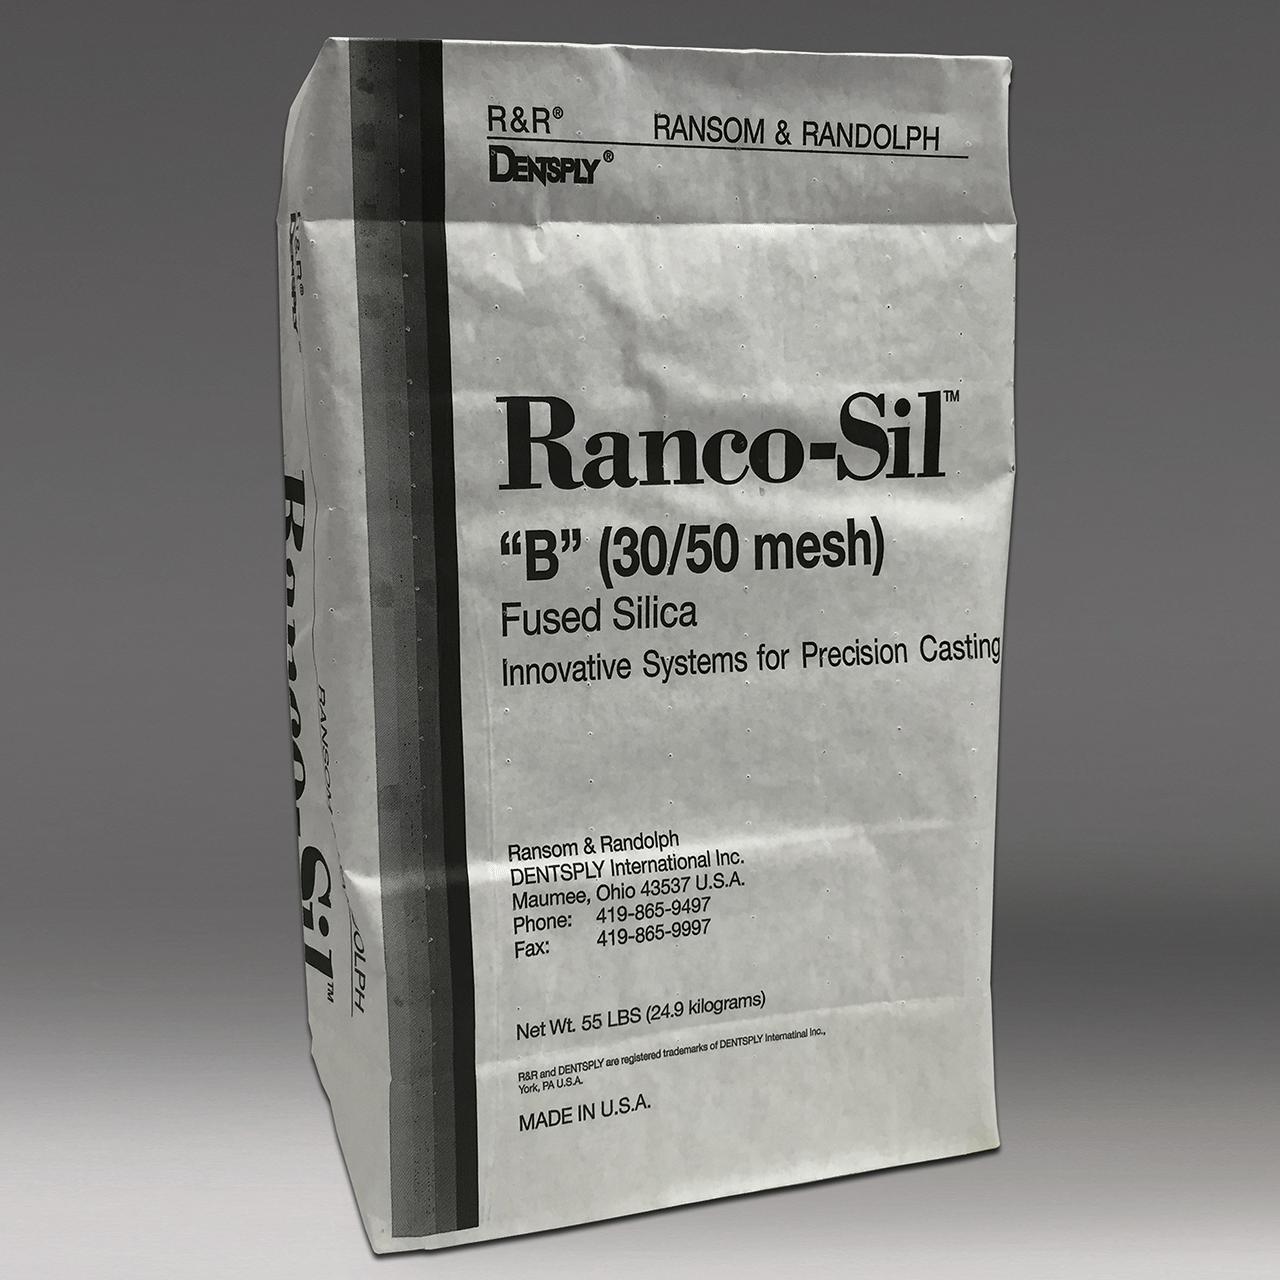 Ranco-Sil™ B (30/50 mesh) fused silica sand - 55 lbs.